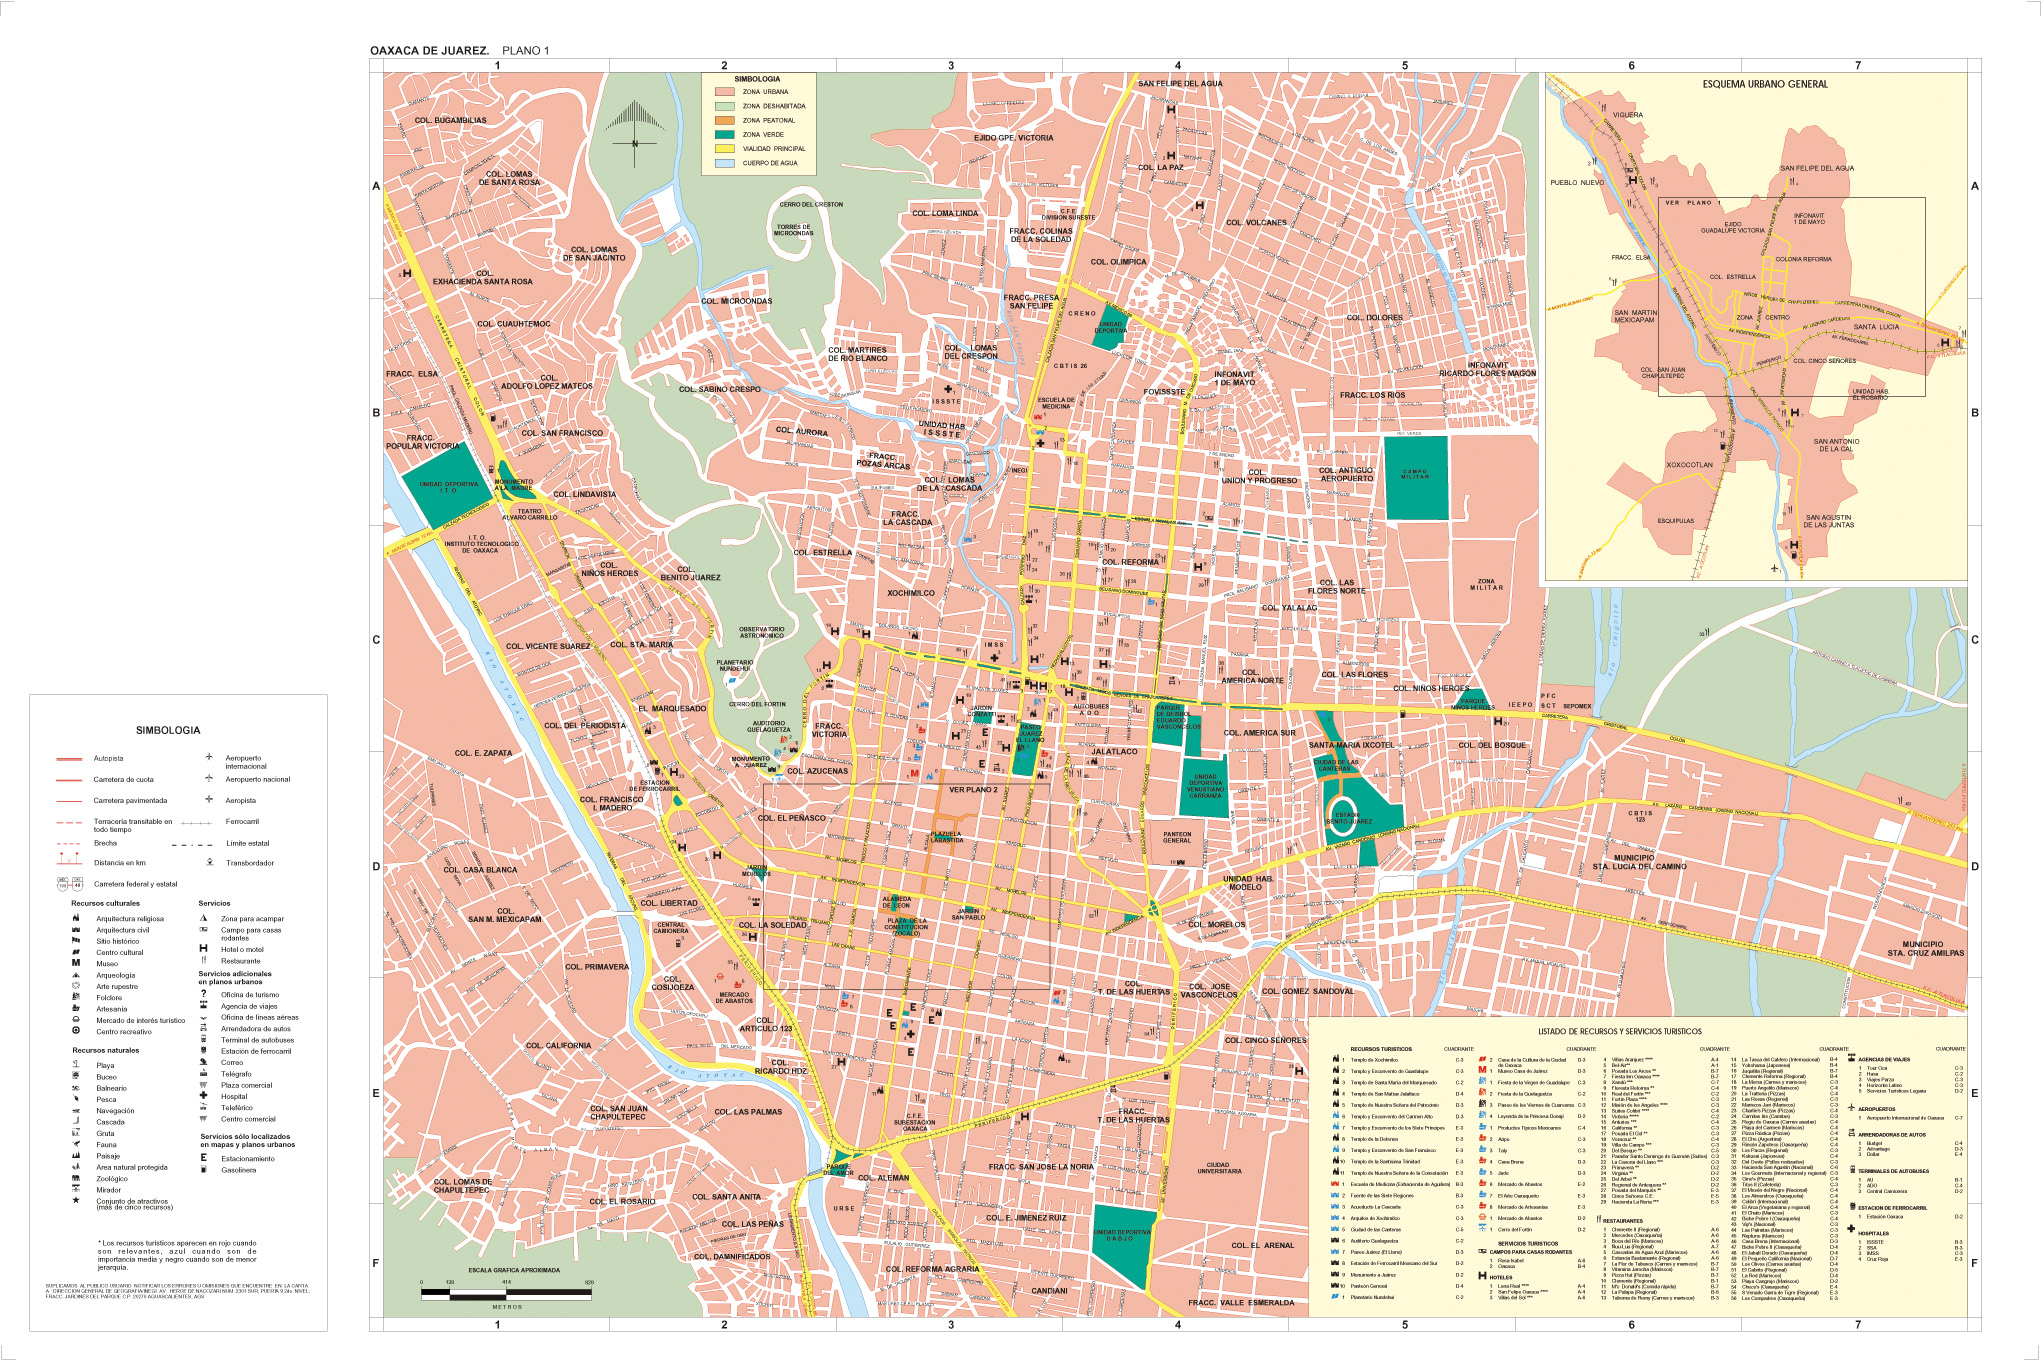 Oaxaca de Juarez City Map, Oaxaca, Mexico